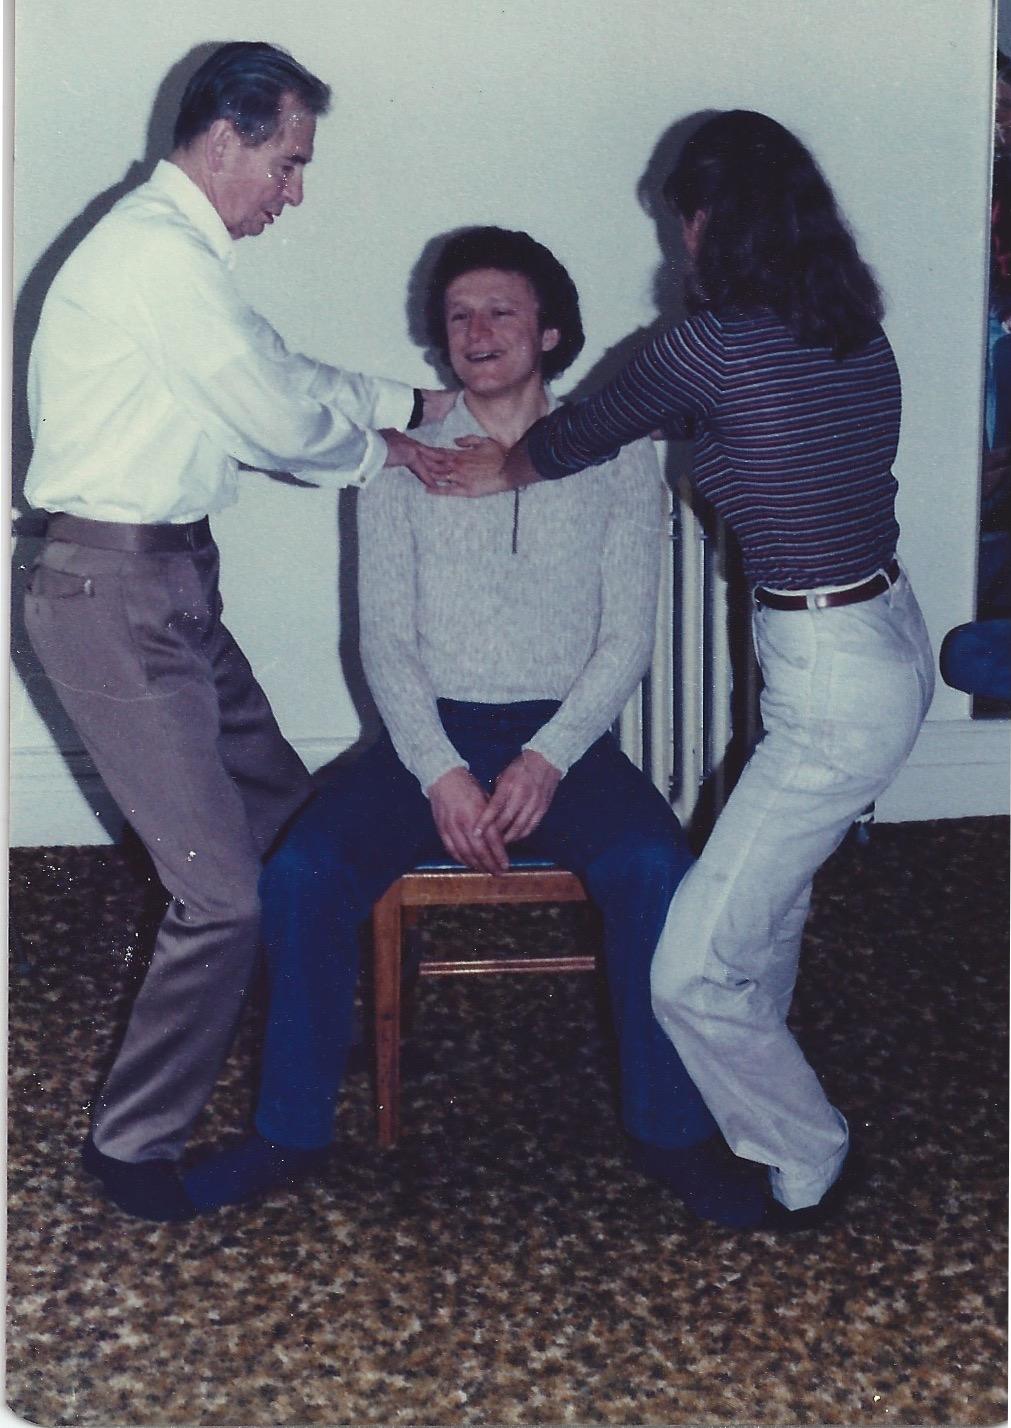 Patrick Macdonald teaching Pamela, 1979